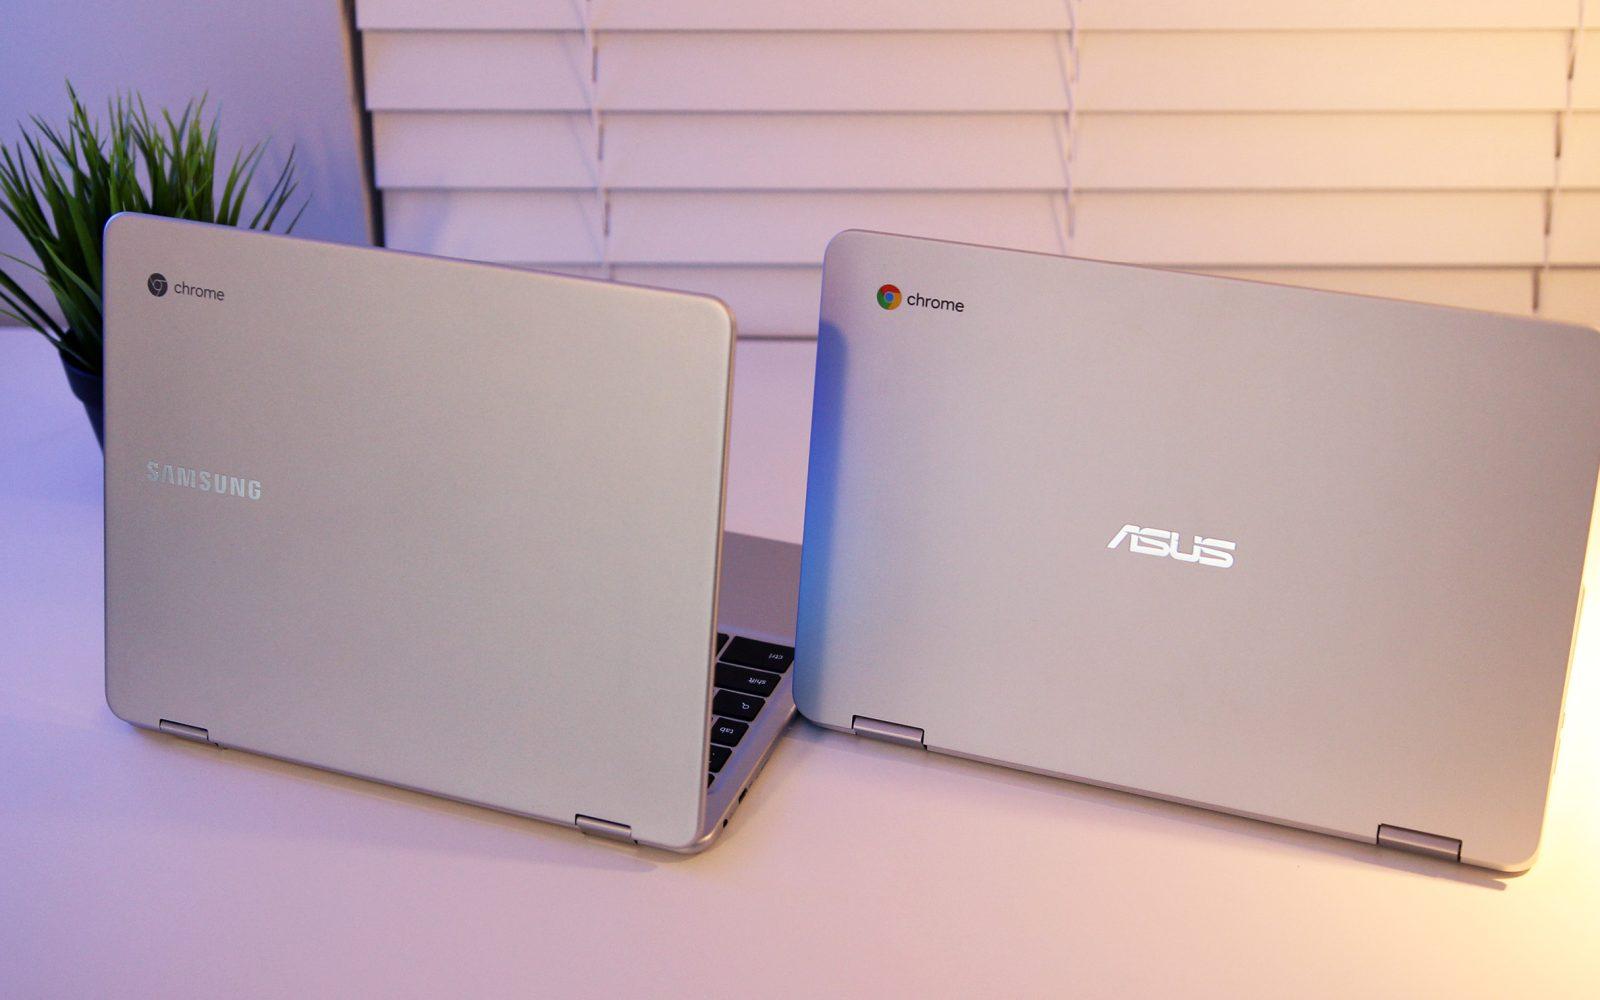 The Best Chromebook: Samsung Chromebook Plus/Pro vs ASUS